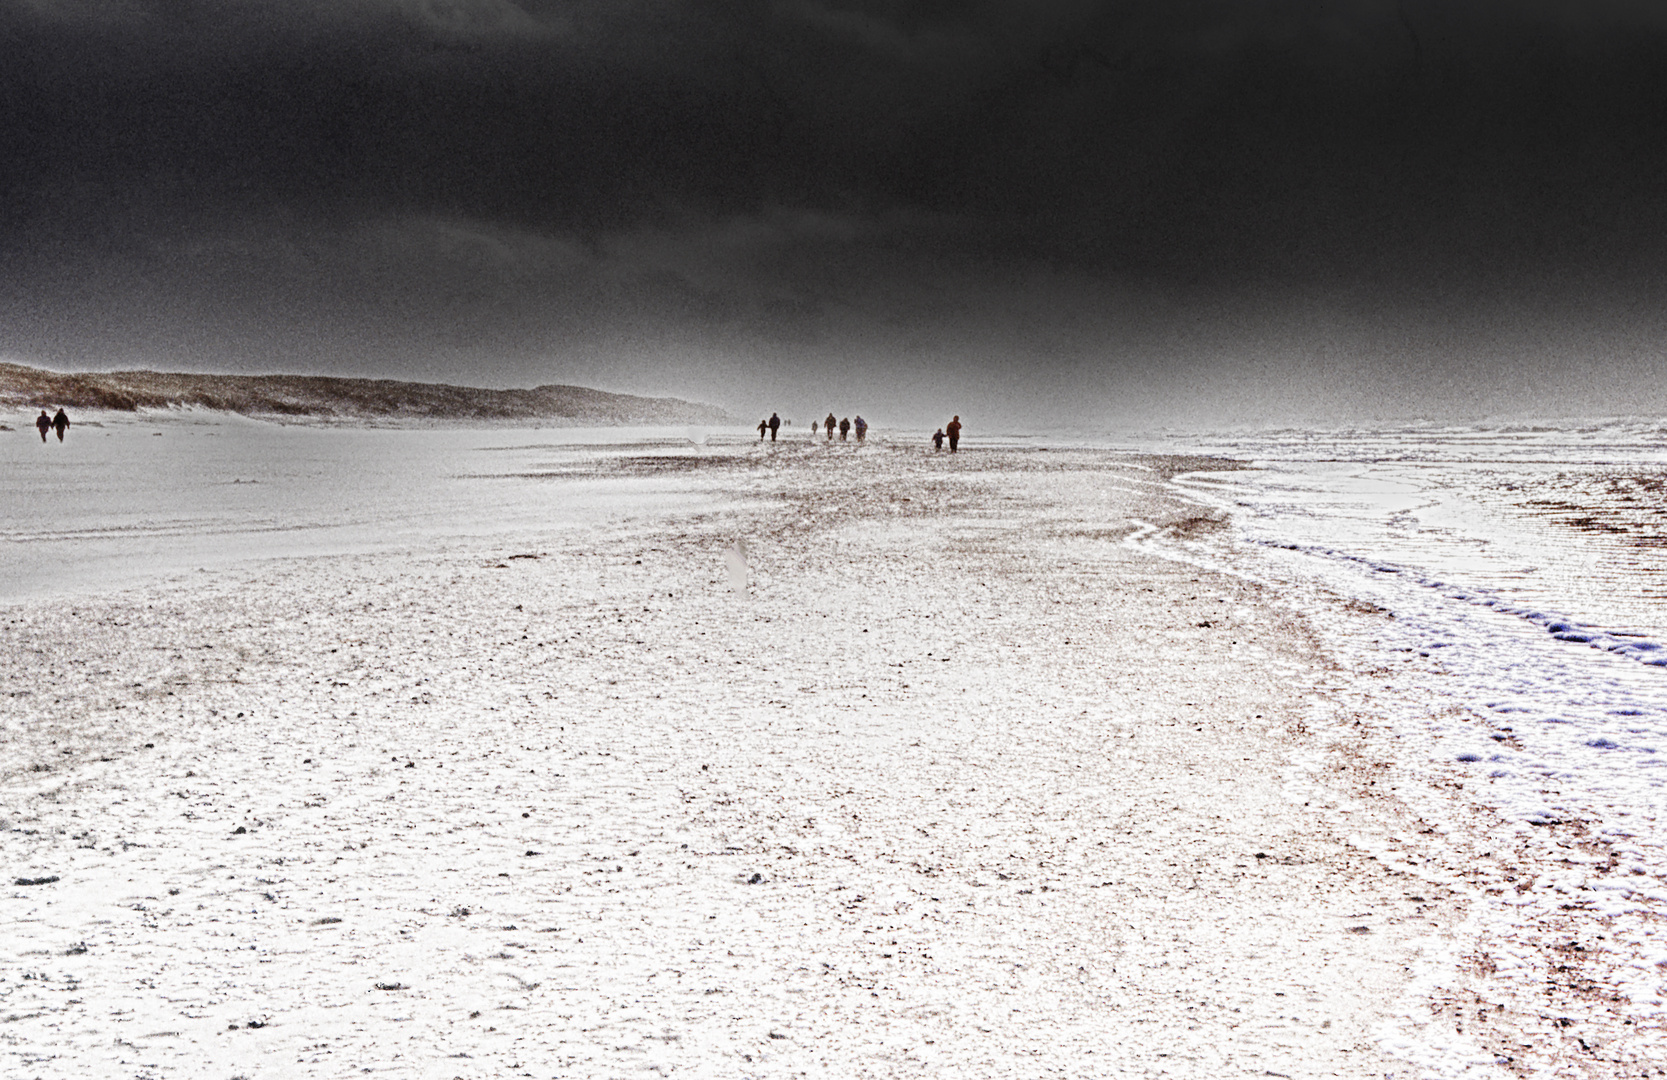 damals - am strand in dänemark ...